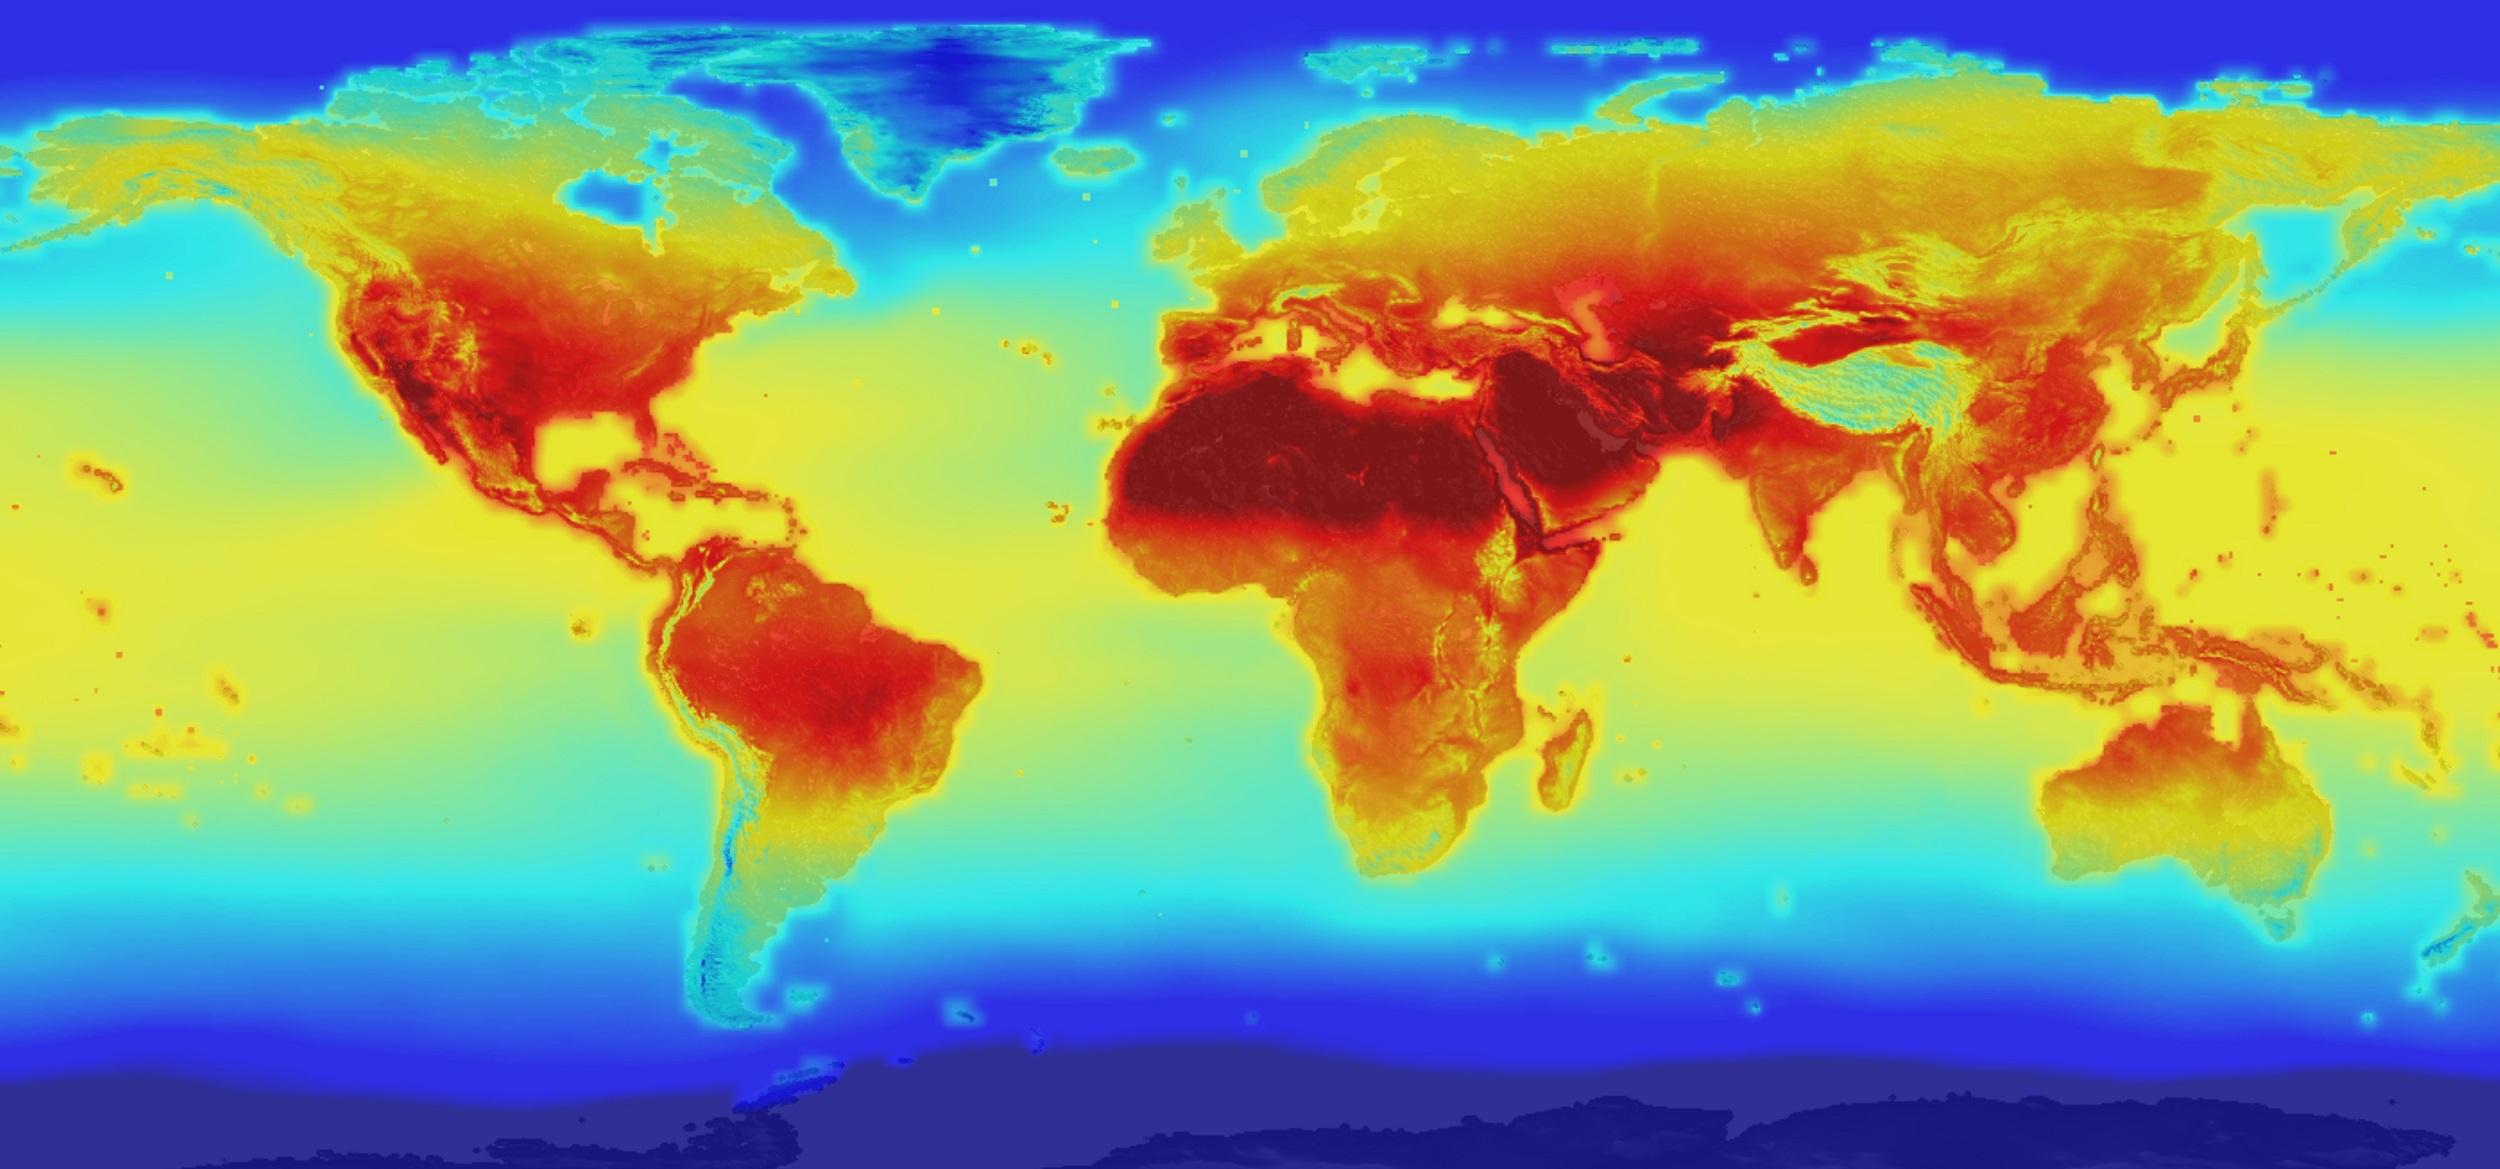 image courtsey of NASA, 2015, Detailed Global Climate Change Simulation